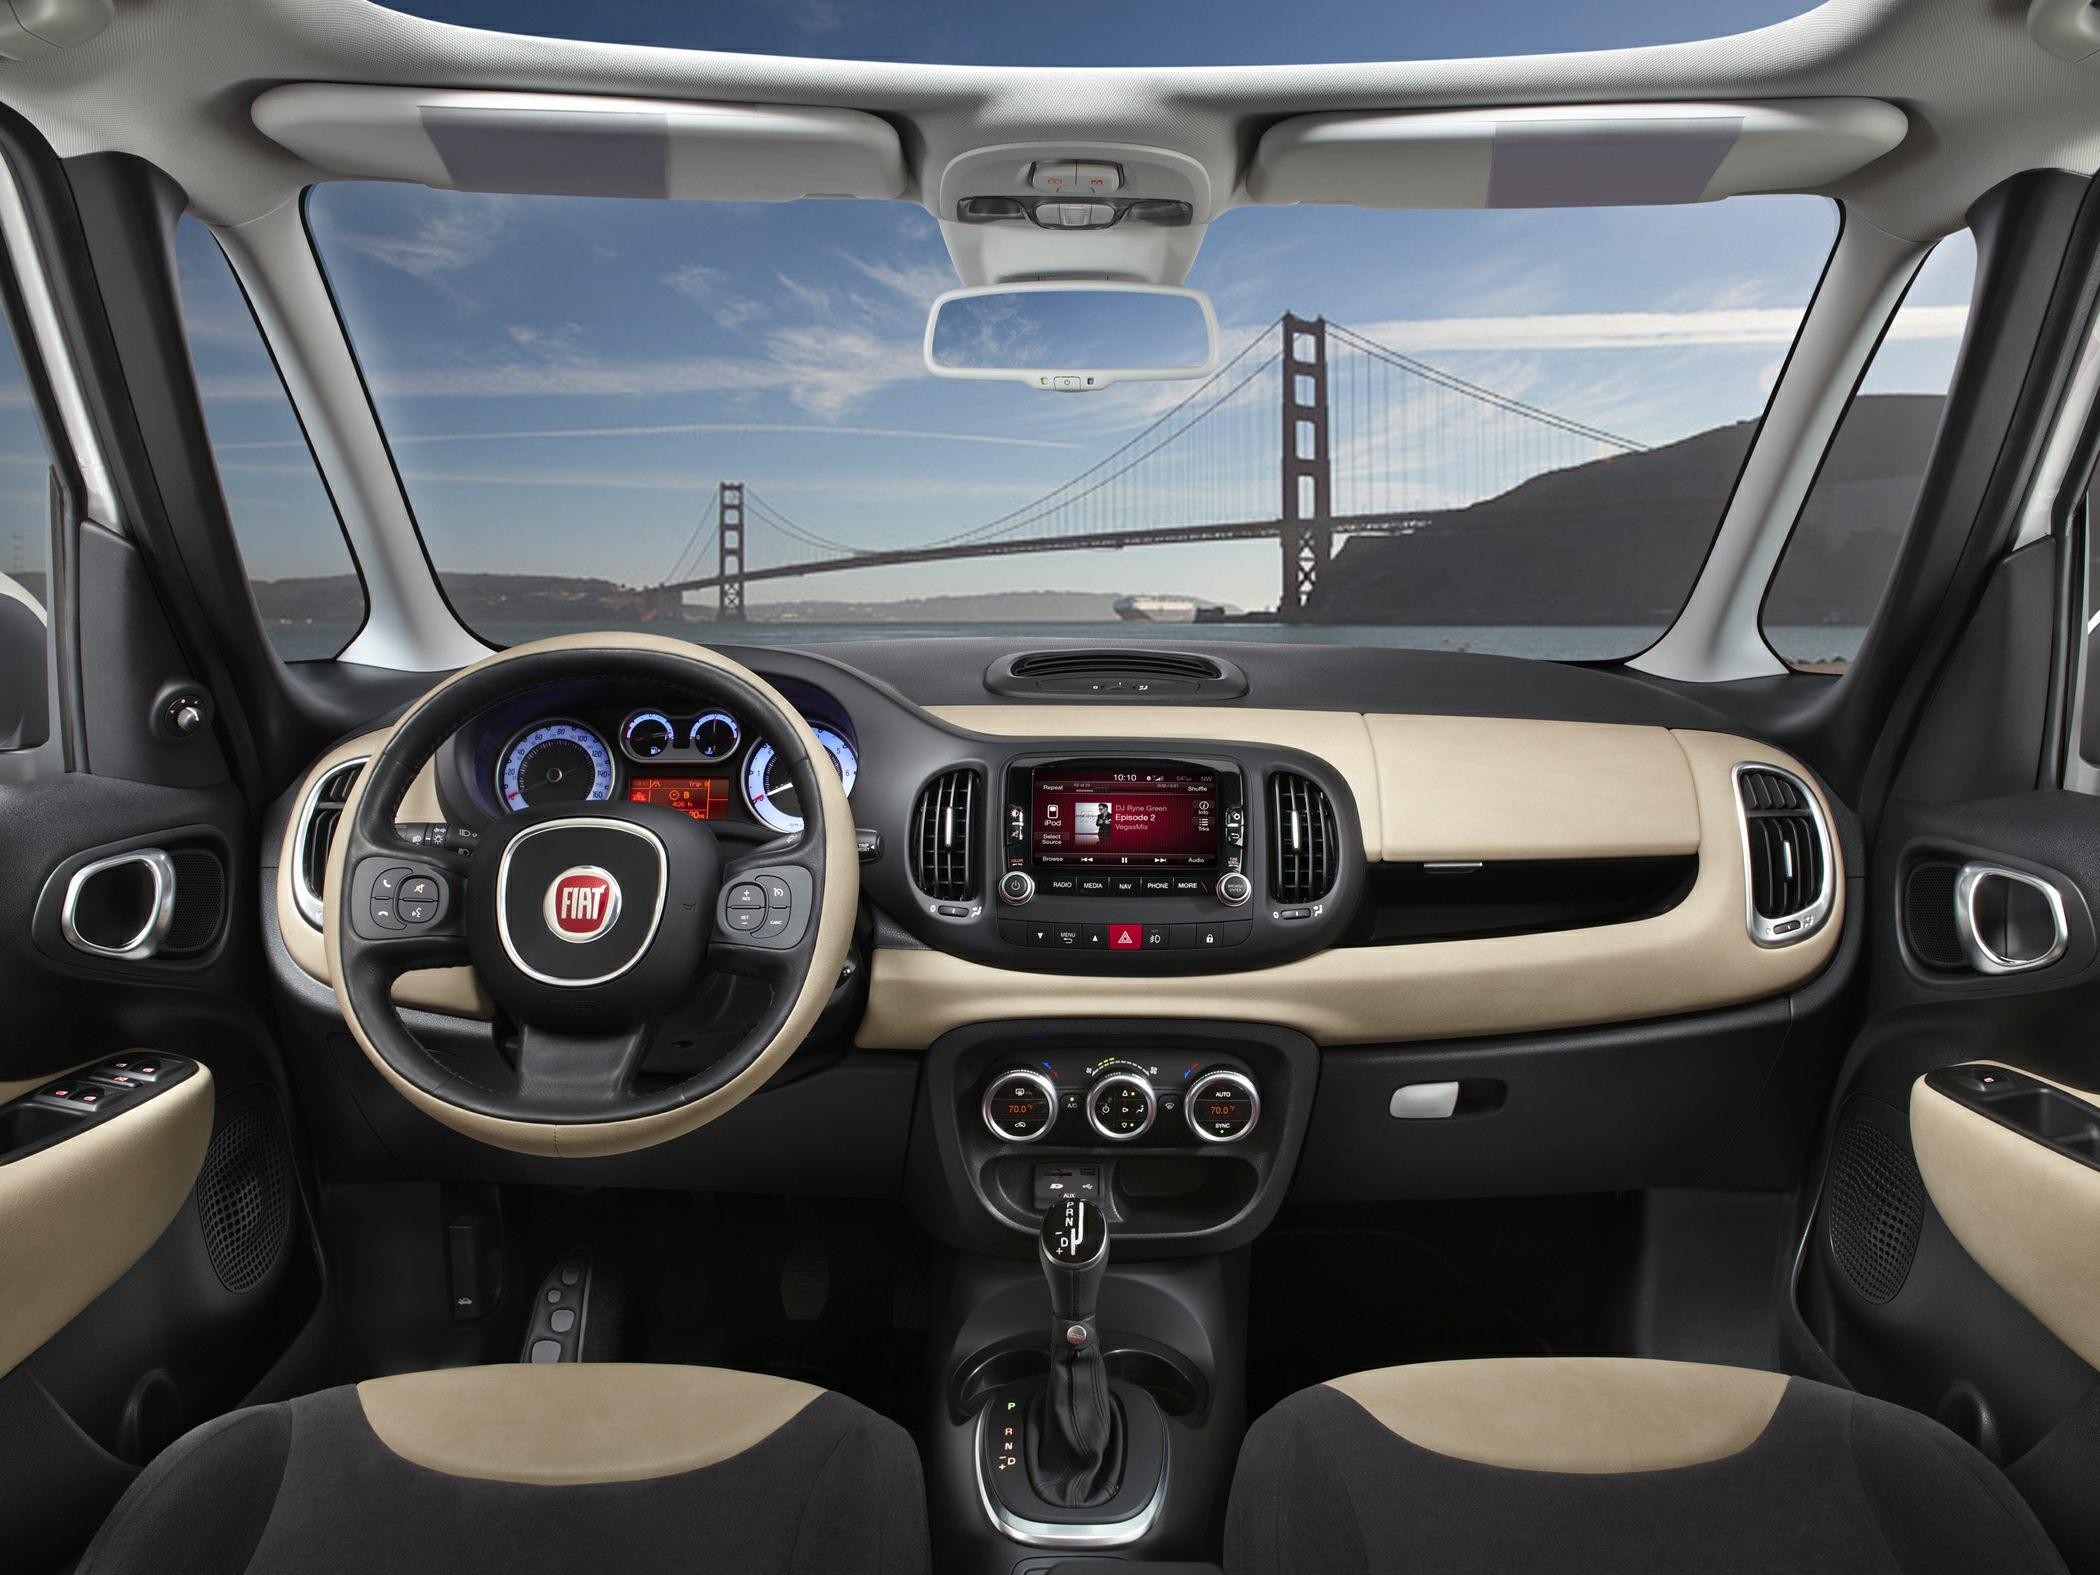 2014 Fiat 500L Glamour Interior